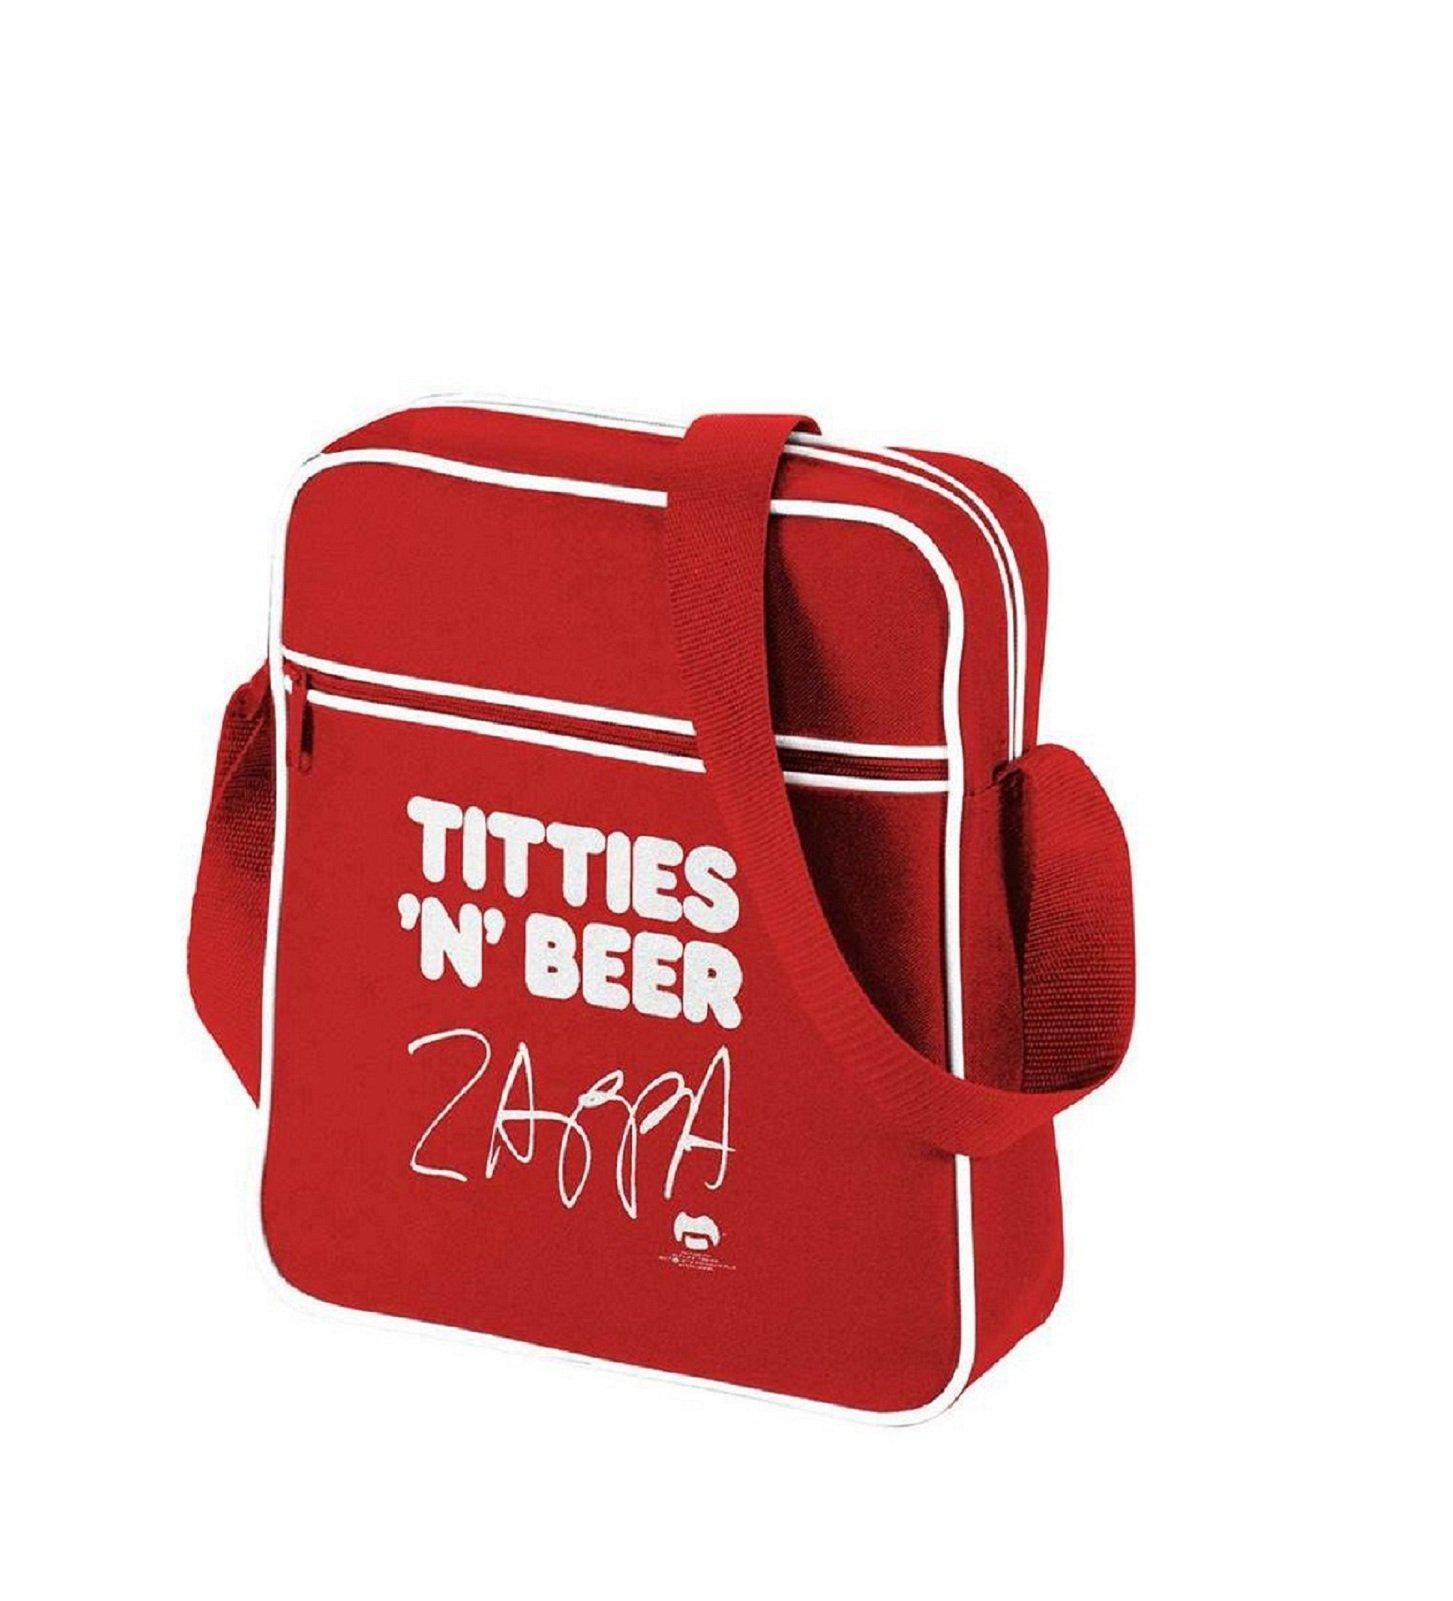 Frank Zappa Titties N Beer Official New Red Mini retro flight Bag